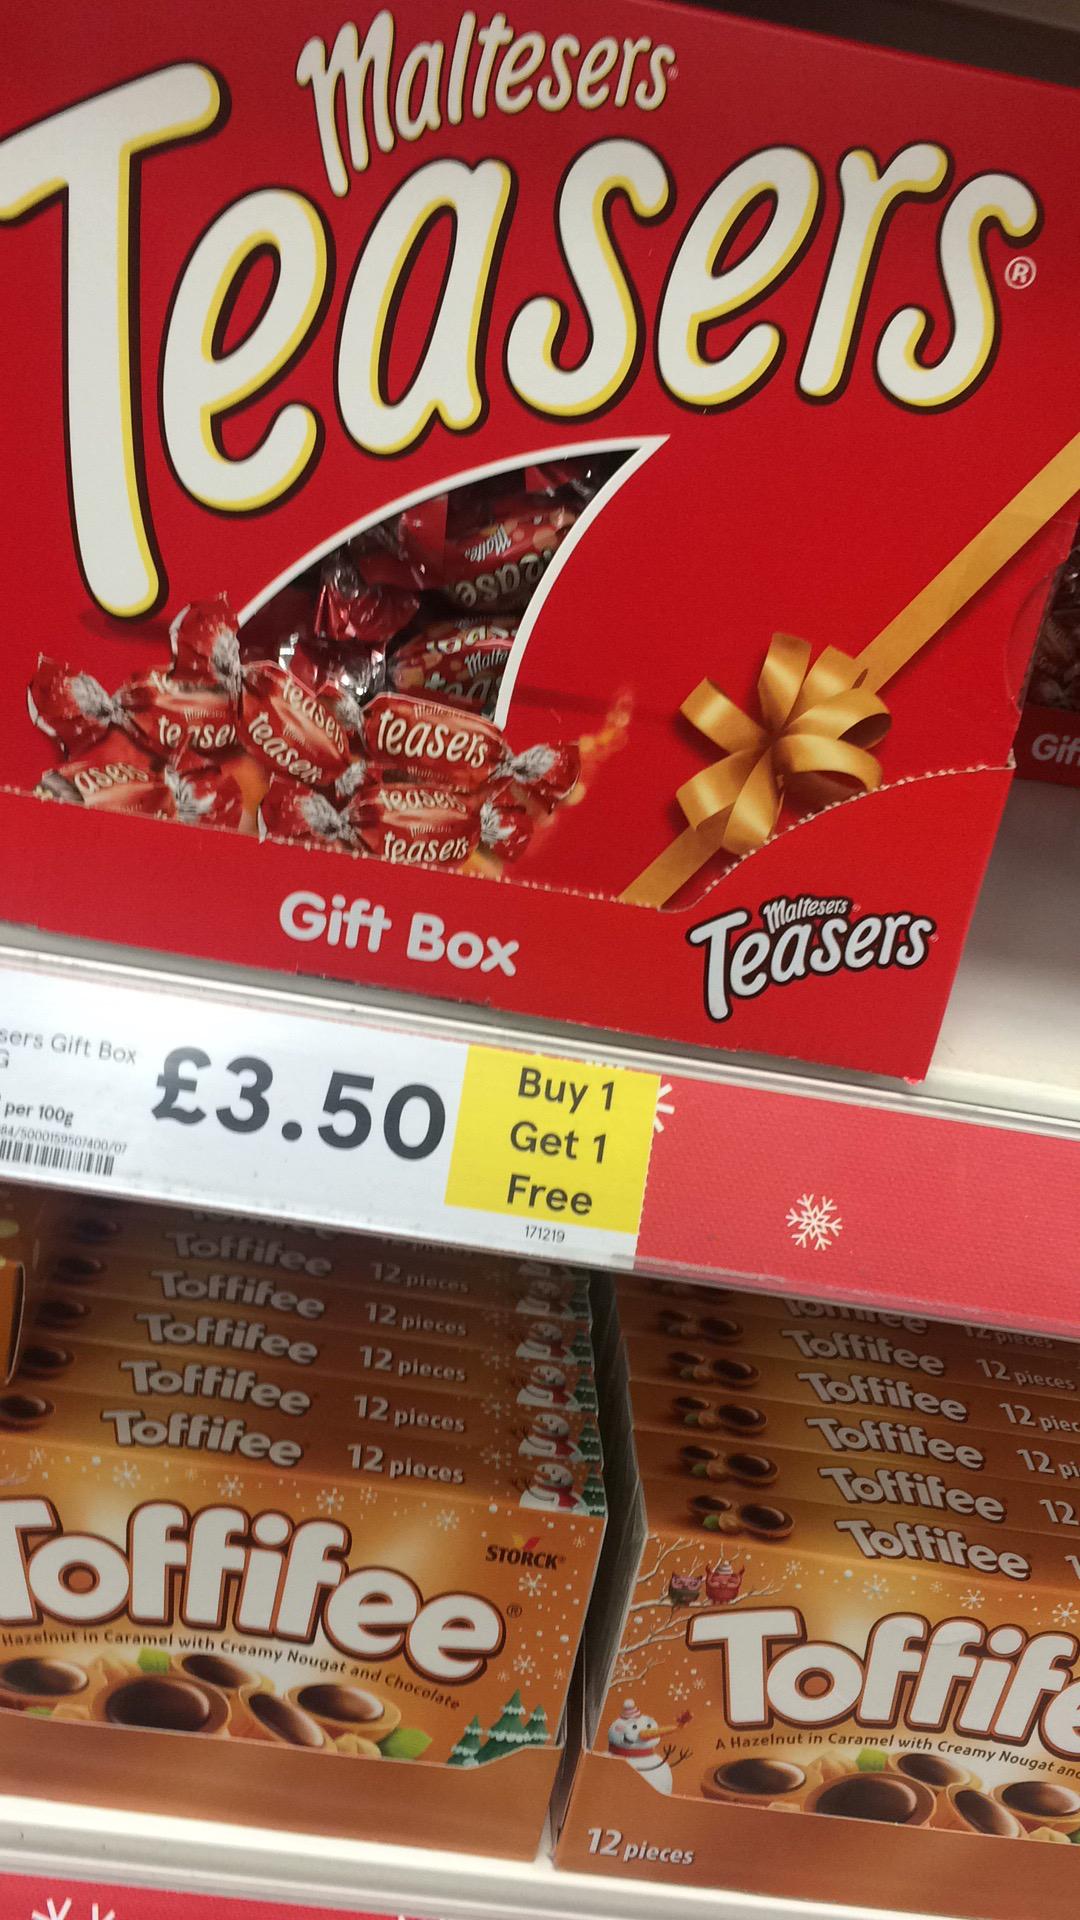 box Gift discount offer & Malteser teasers gift box bogof £3.50 @ tesco! - Tesco | AceDealClub Aboutintivar.Com